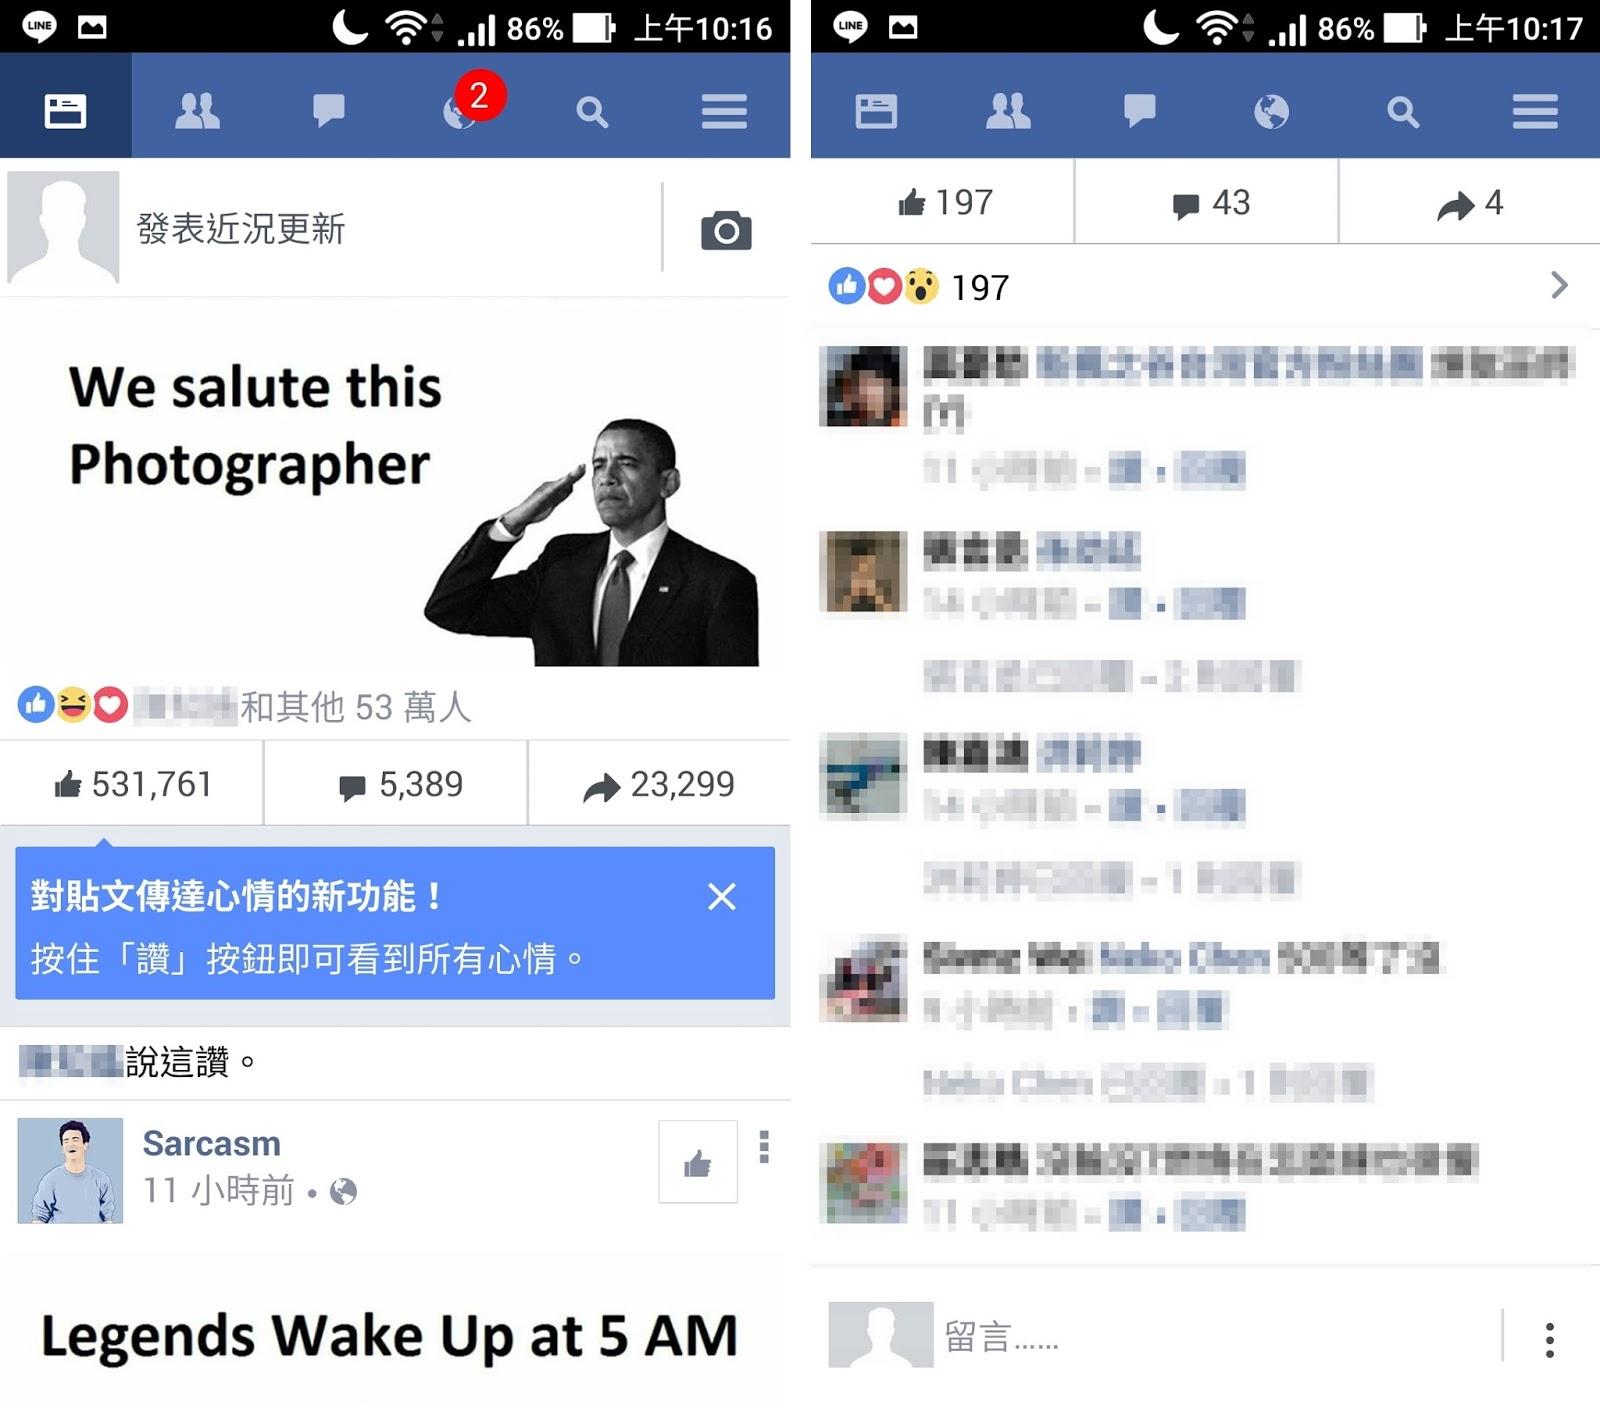 Screenshot 20170603 101644 - Facebook Lite - 官方推出的輕量版臉書App,超省流量及系統資源、把你用不到的功能給去掉!